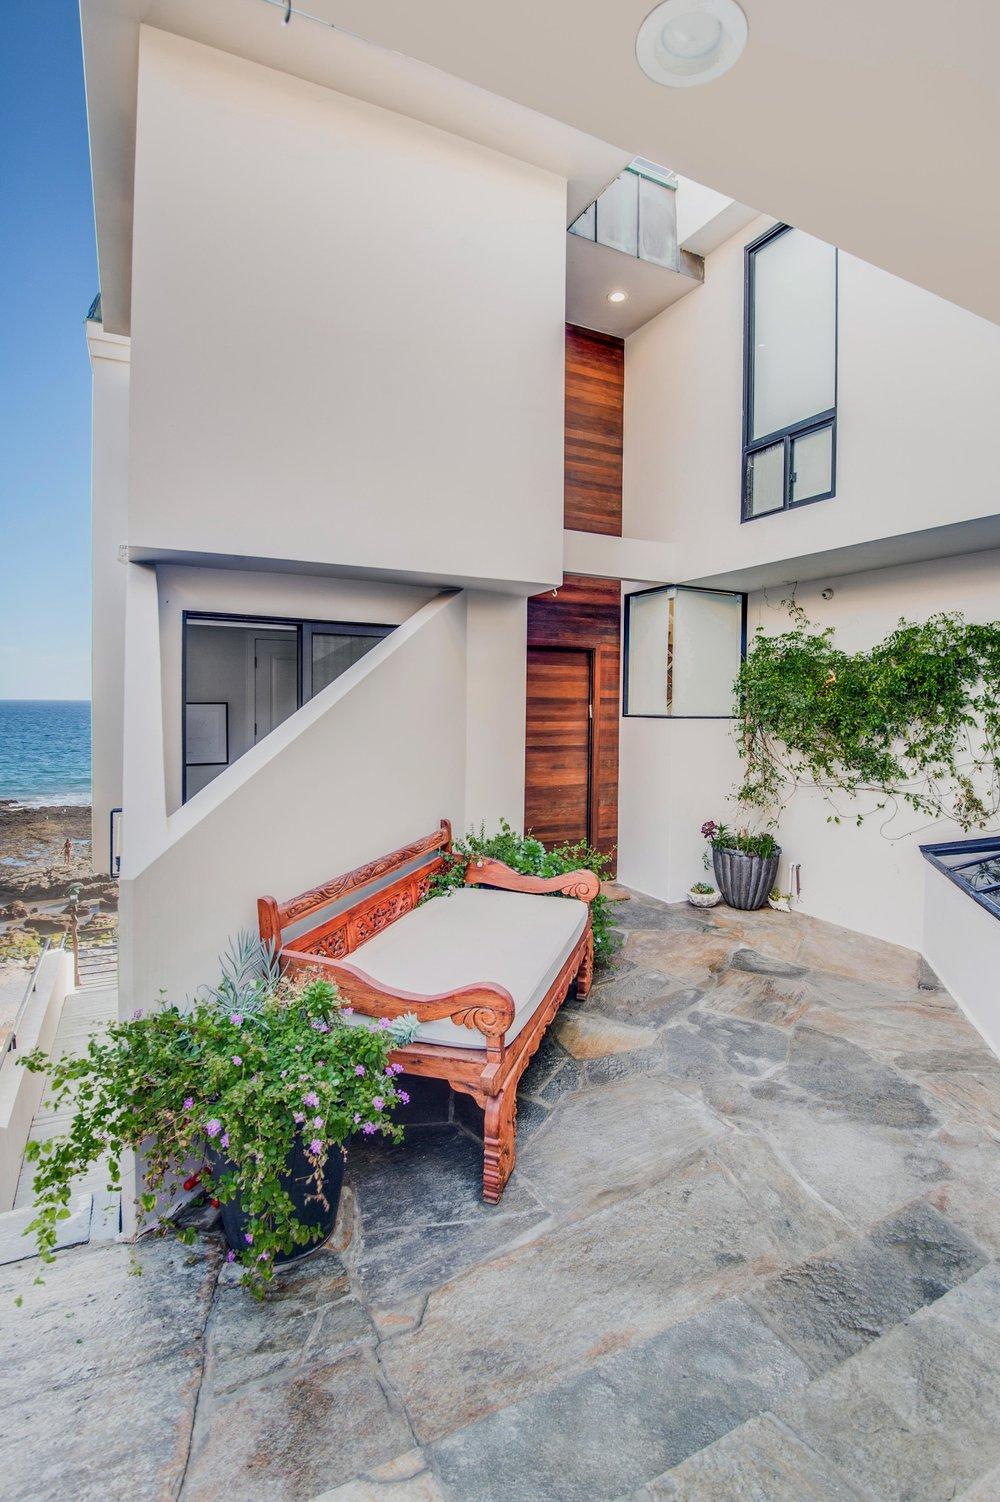 008 Front 25252 Malibu Road For Sale Lease The Malibu Life Team Luxury Real Estate.jpg